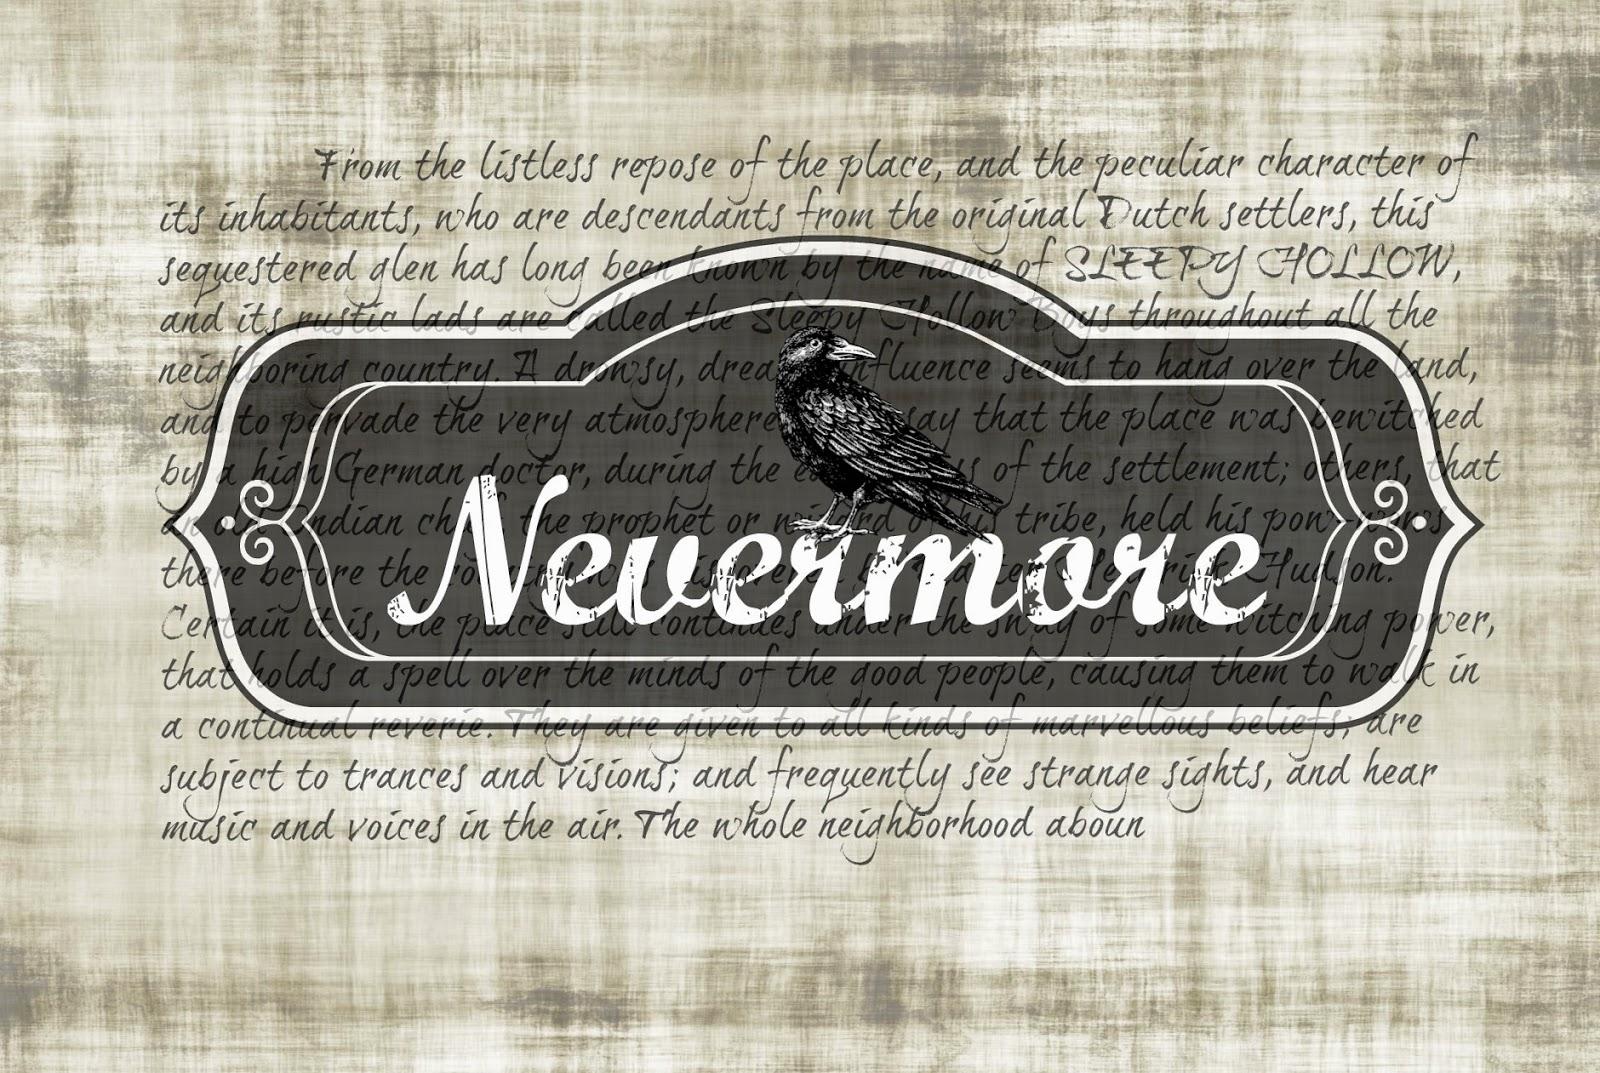 Edgar Allen Poe, The Raven, Halloween Printable, spooky, Easy Halloween DIY, Nevermore Quoth the Raven